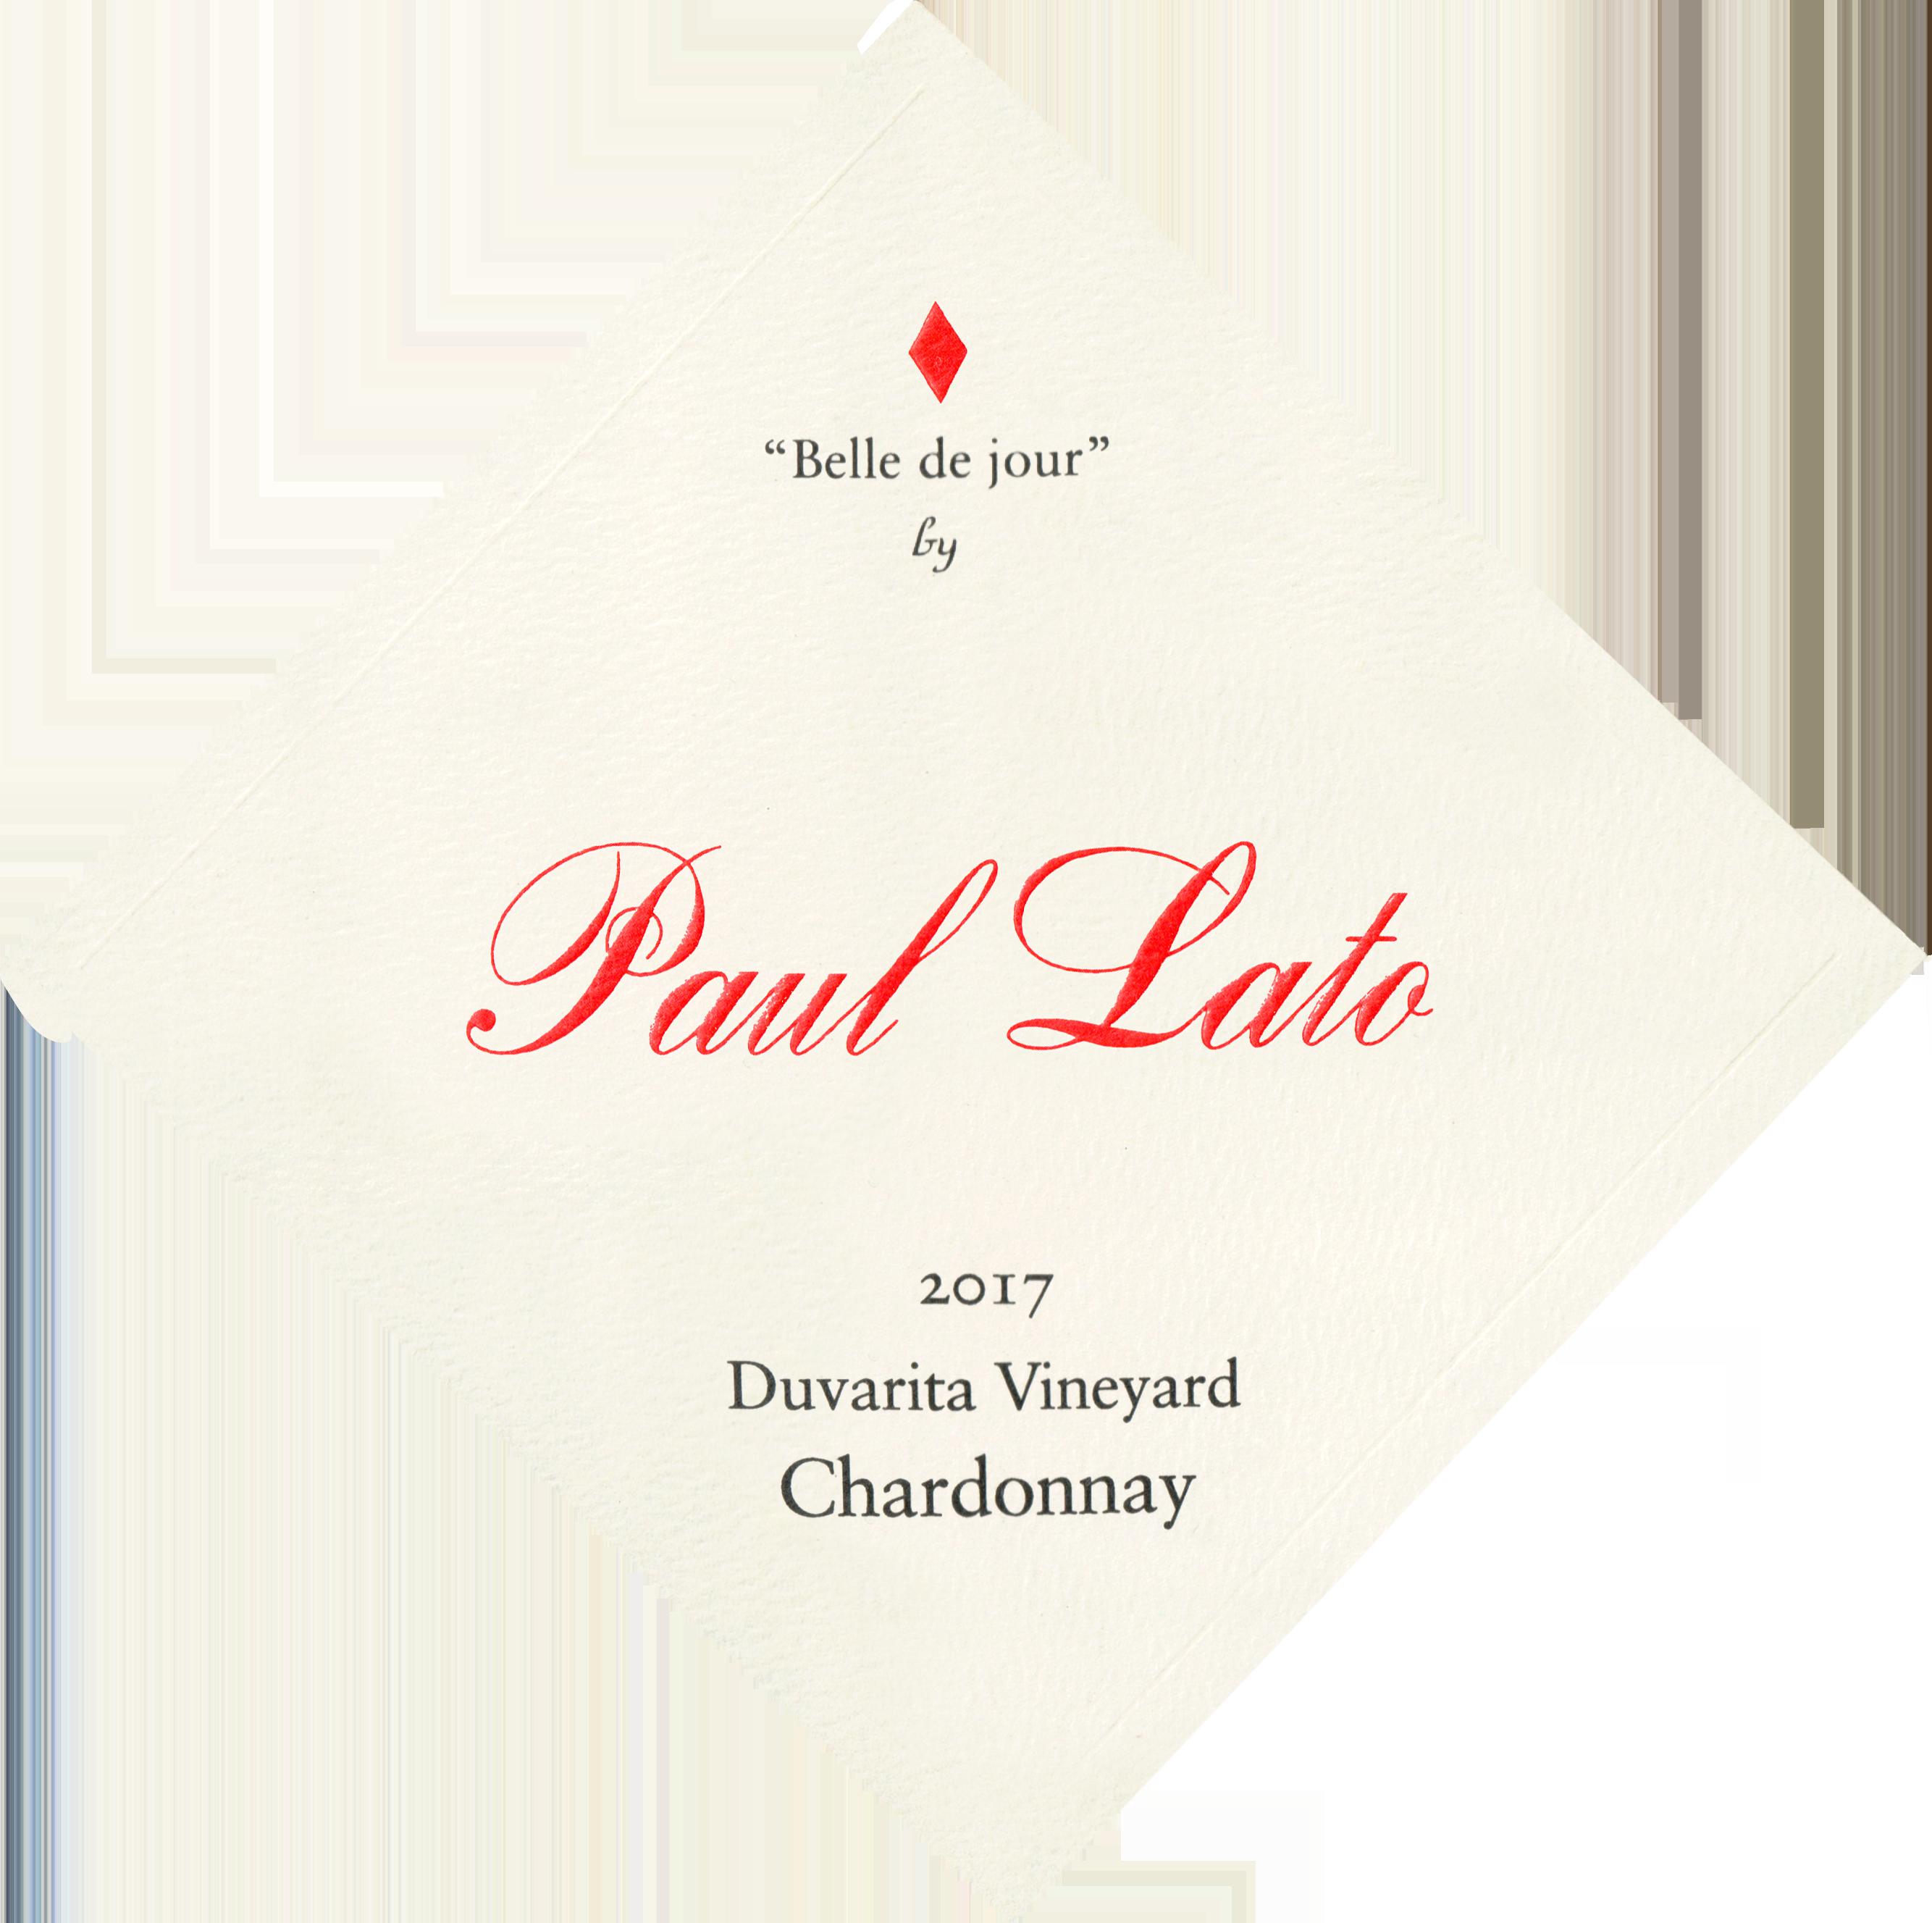 Paul Lato Belle Du Jour Duvarita Vineyard Chardonnay 2017